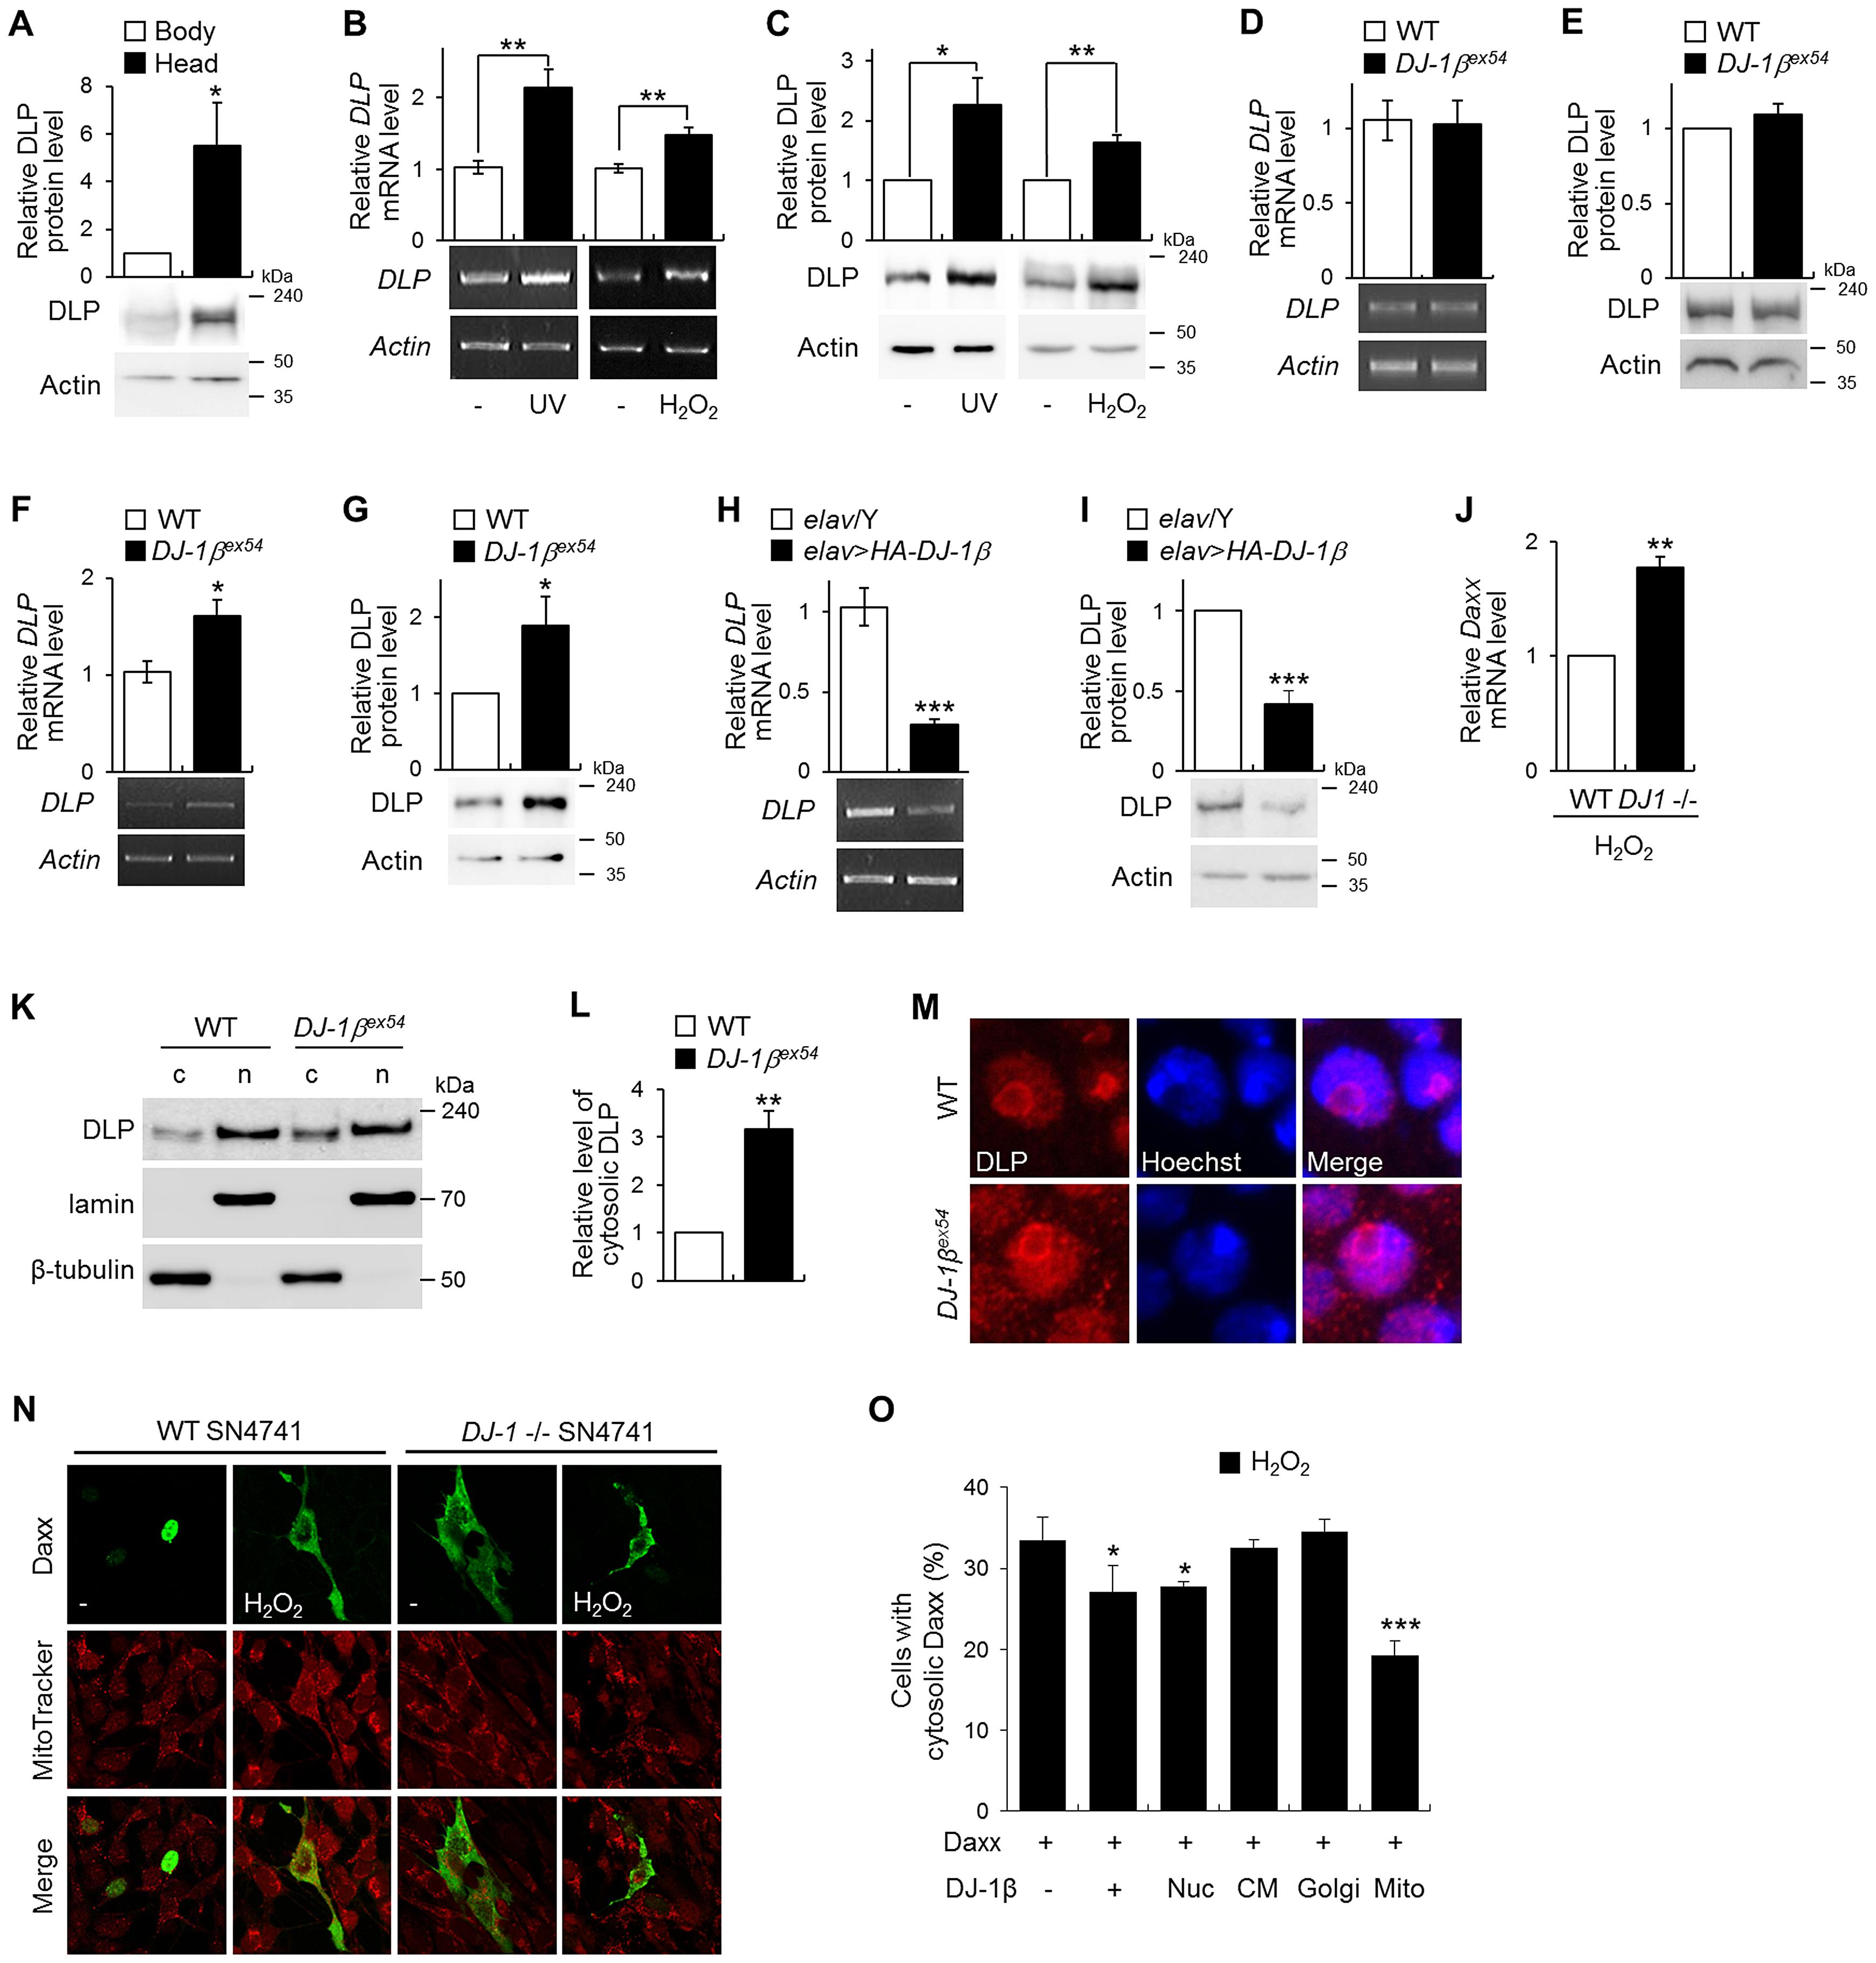 Gene expression of DLP by oxidative stress, UV, and <i>DJ-1β</i>.